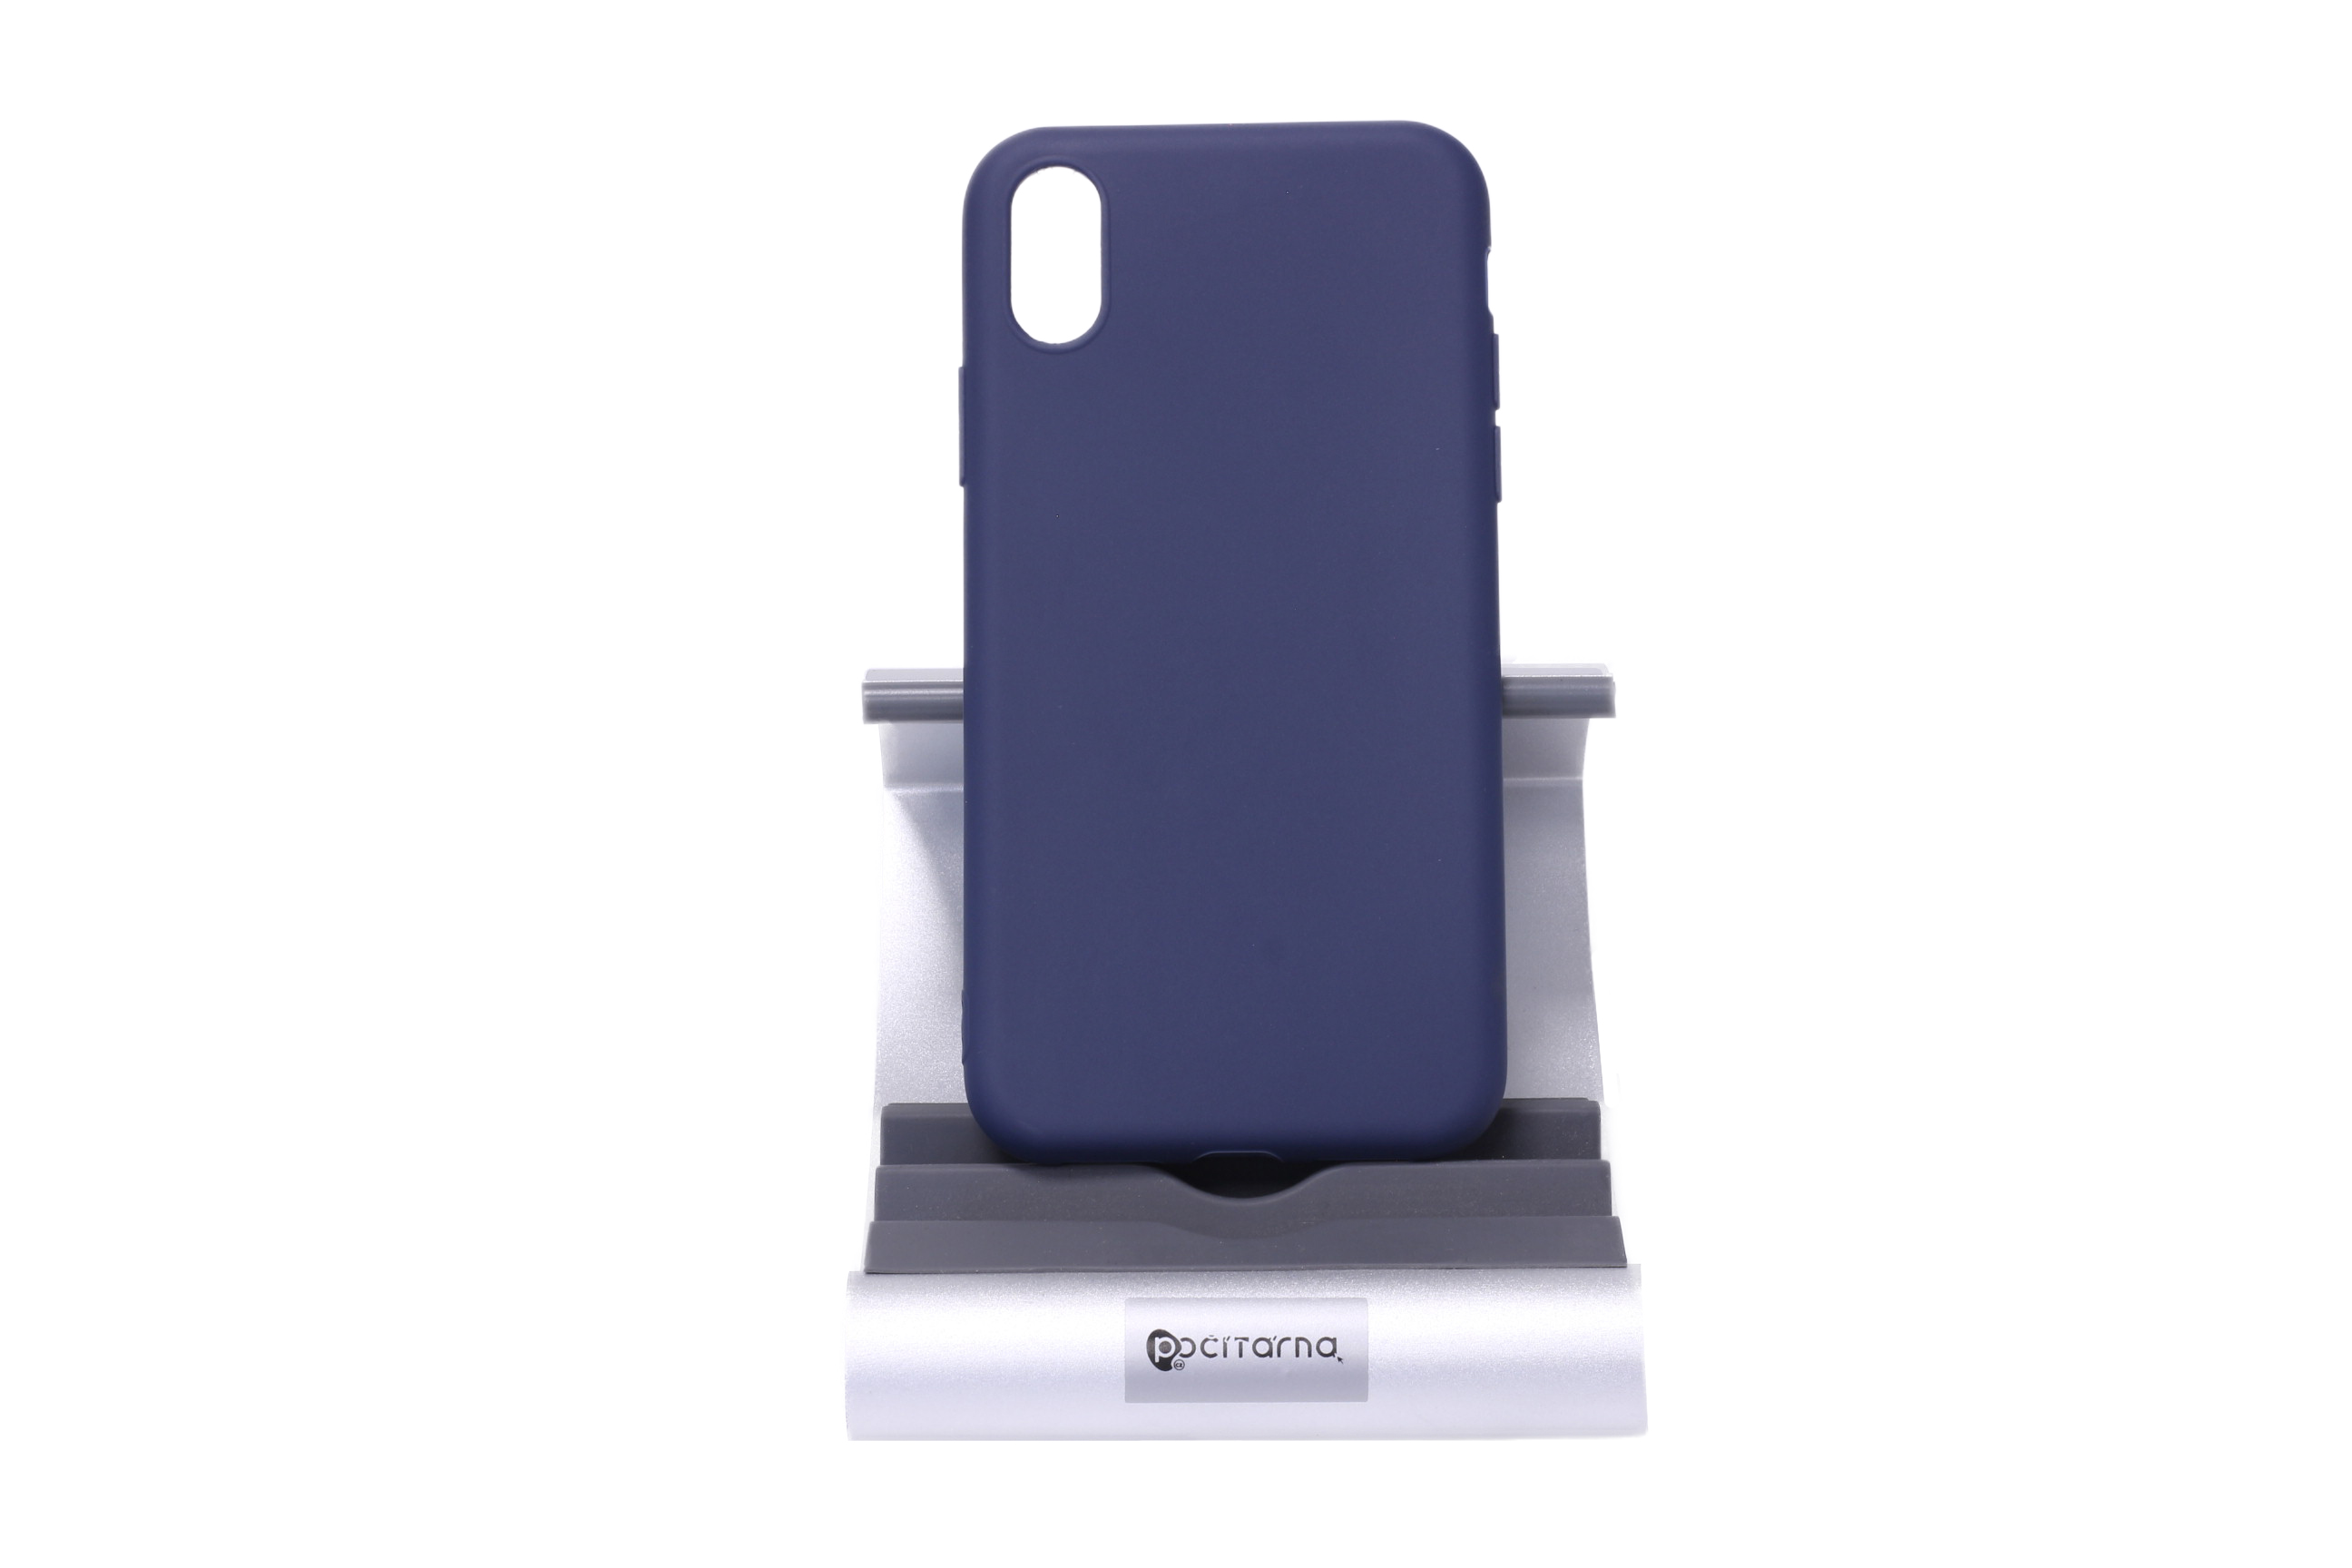 Ochranný kryt pro iPhone X/Xs - Tmavě modrý